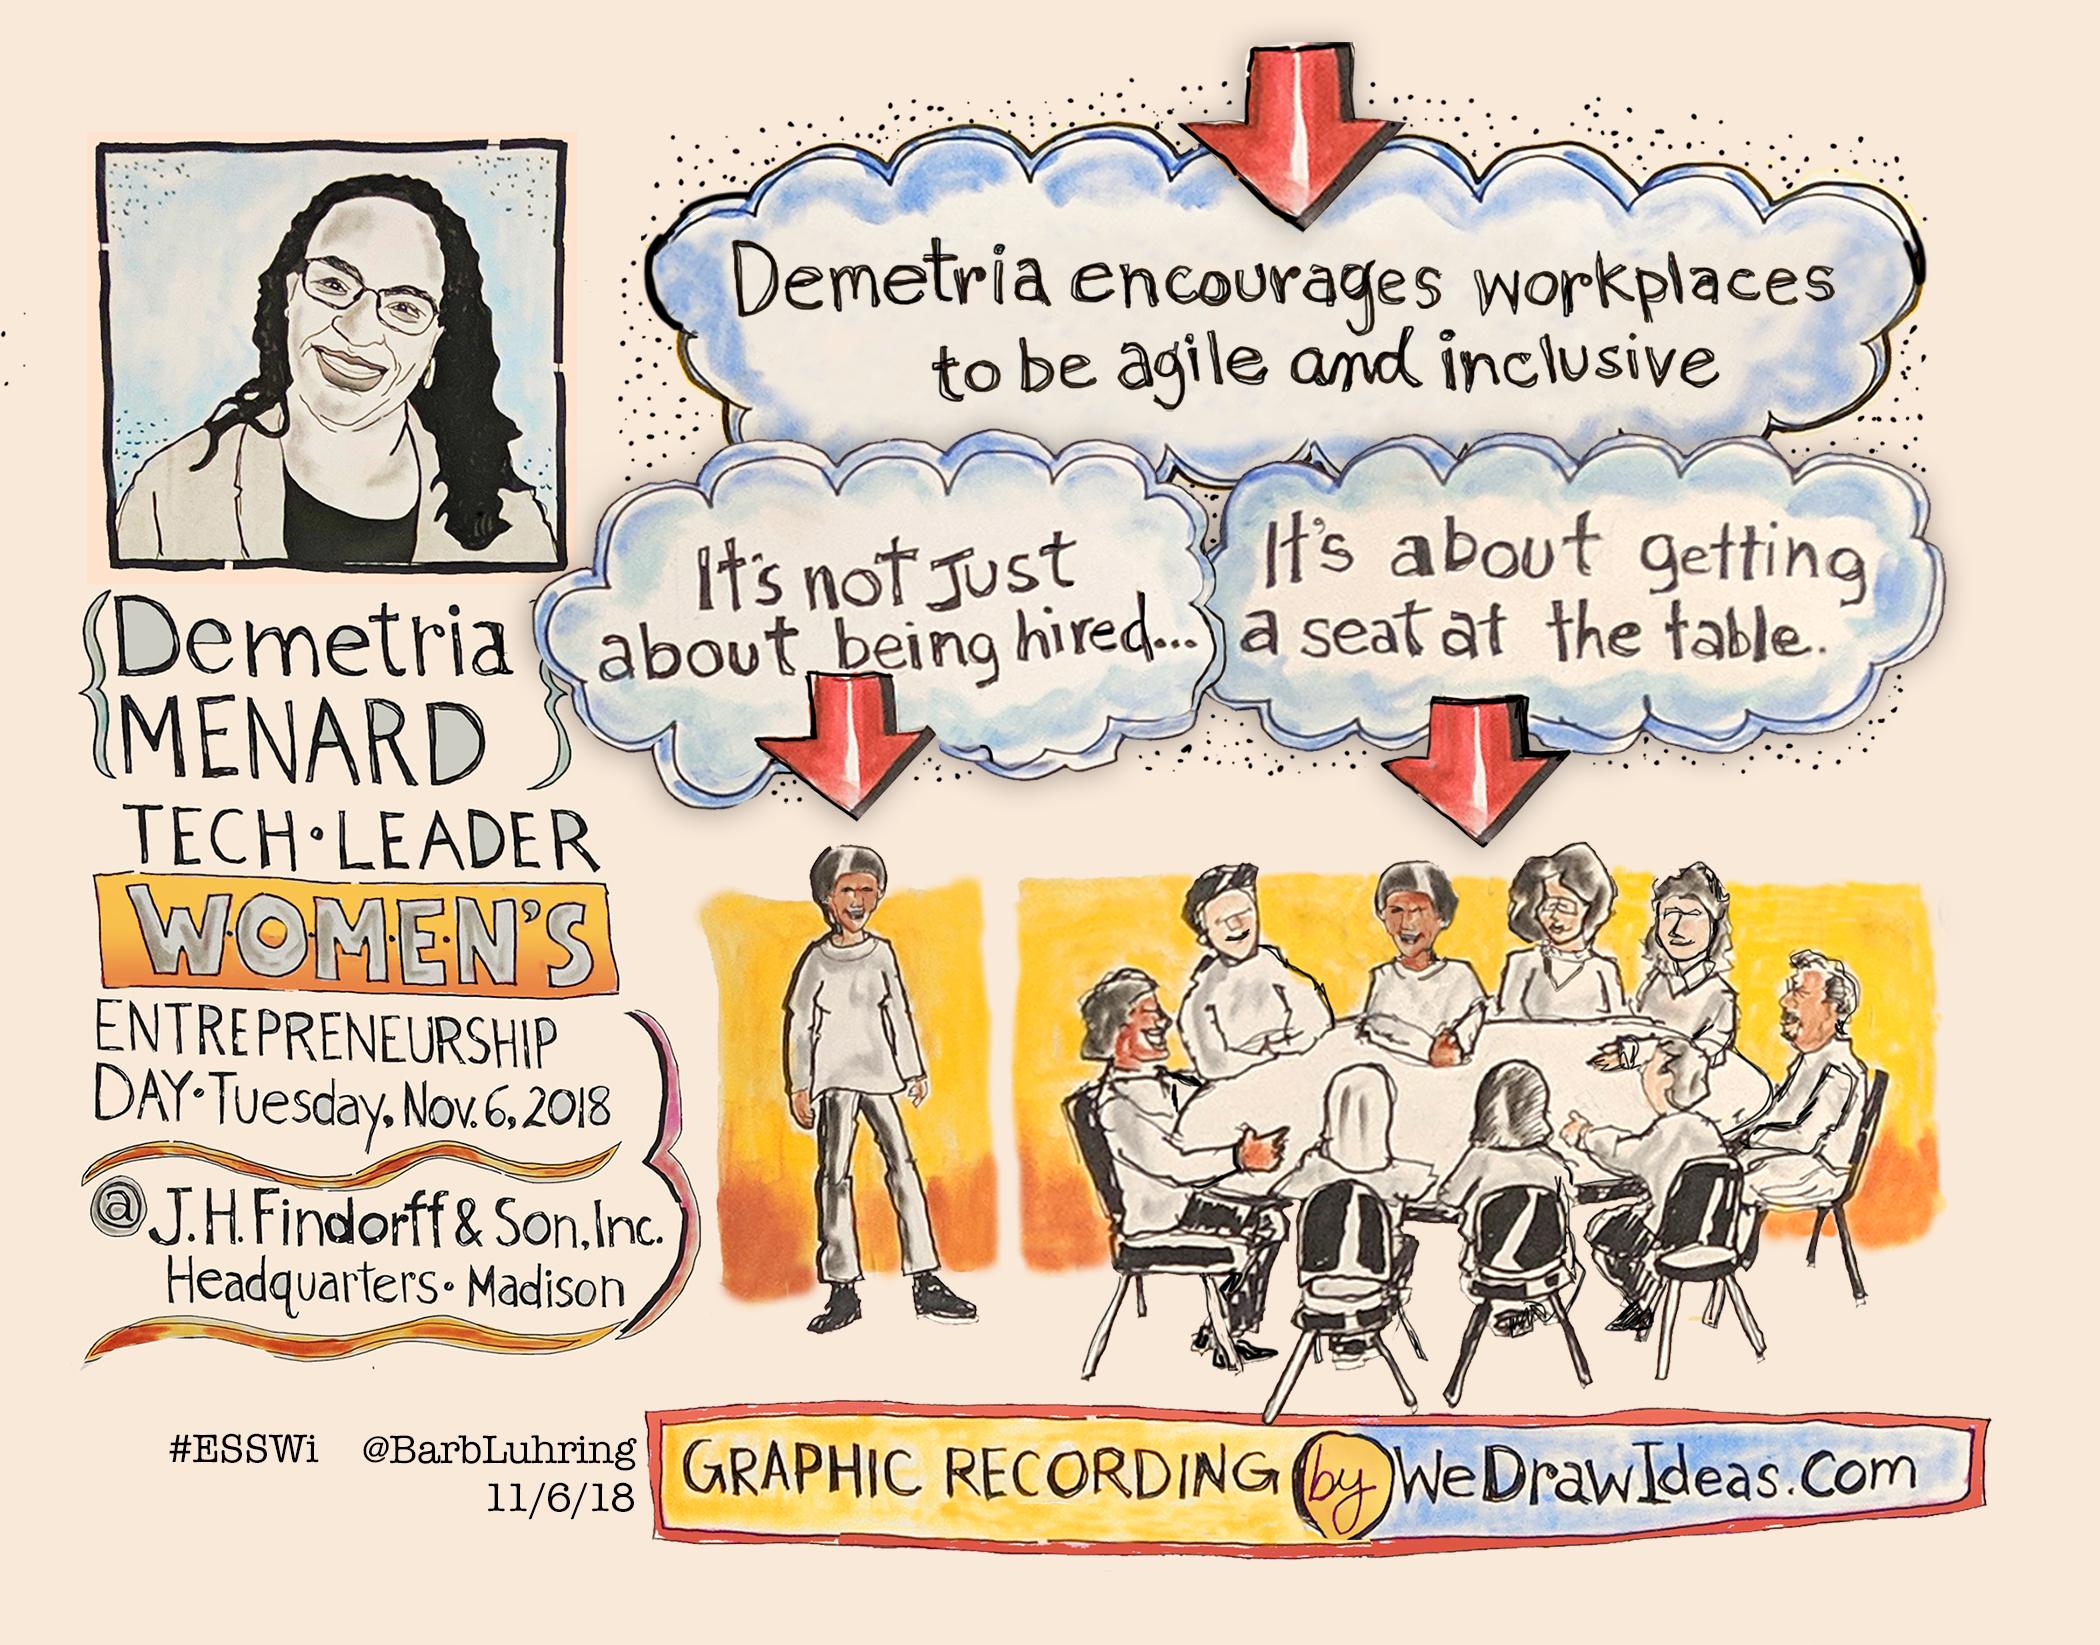 Demetria Menard - Tech Leader